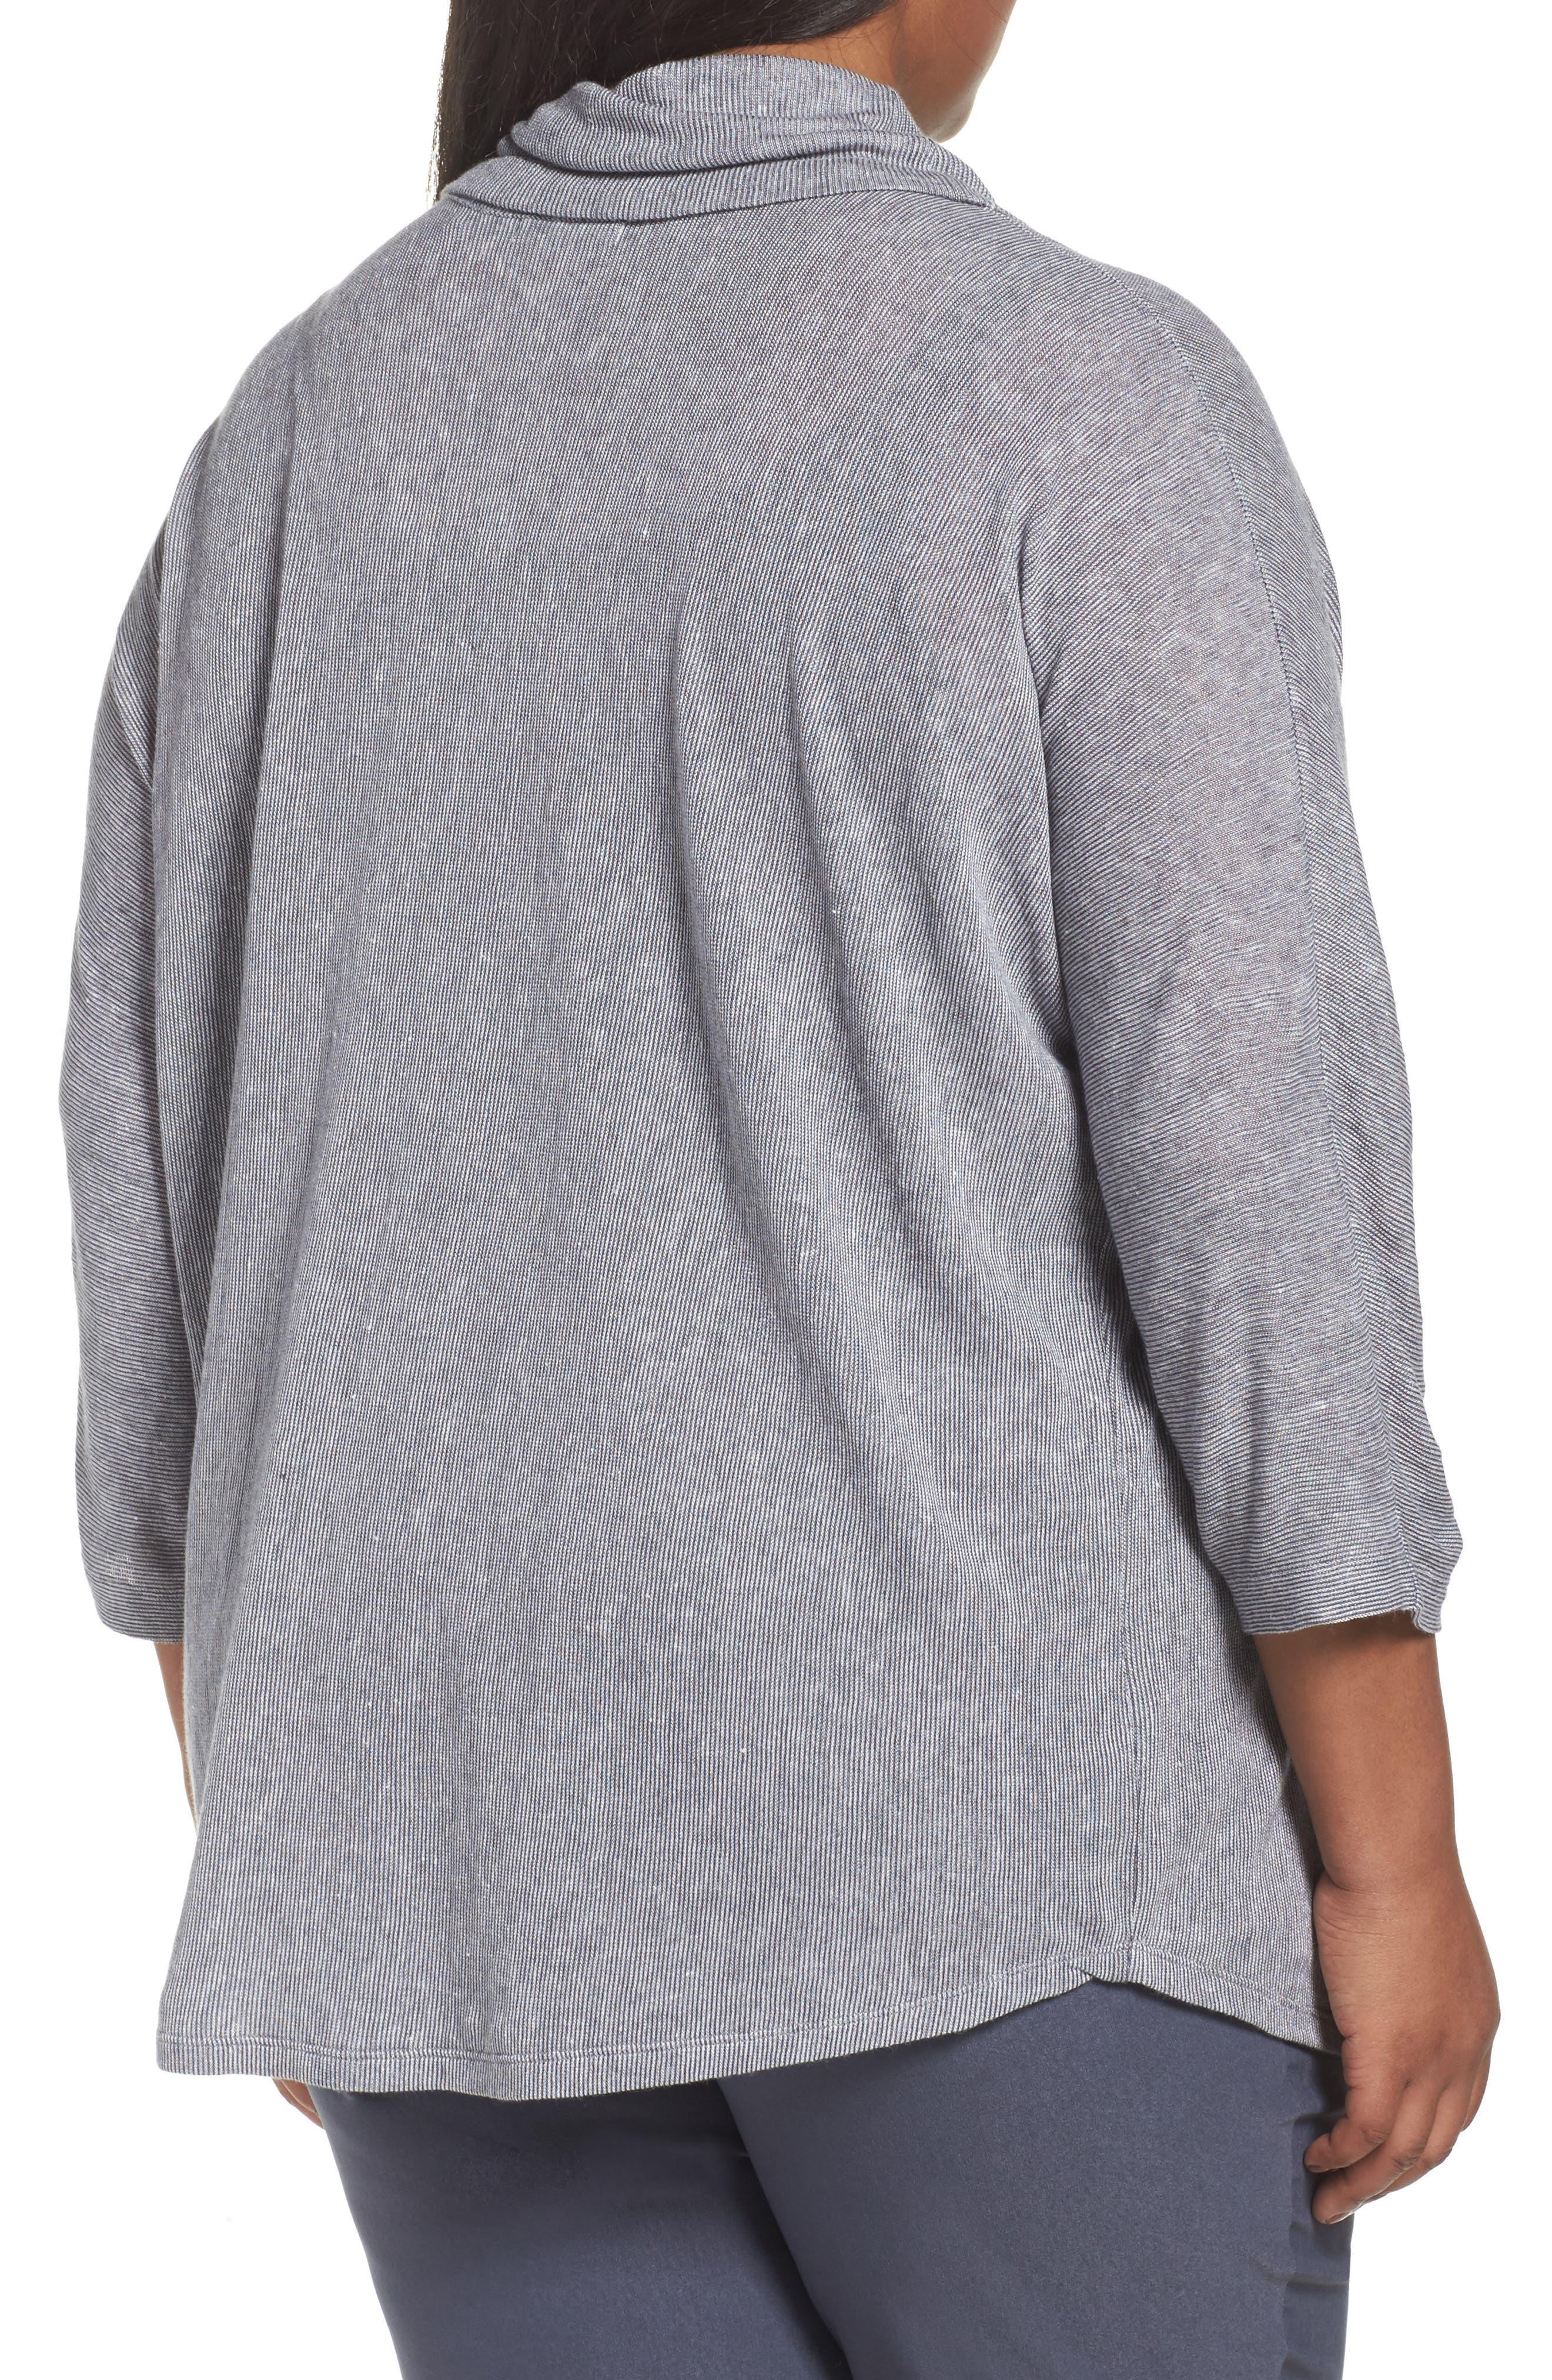 Alternate Image 2  - NIC+ZOE Blissful Cowl Neck Top (Plus Size)